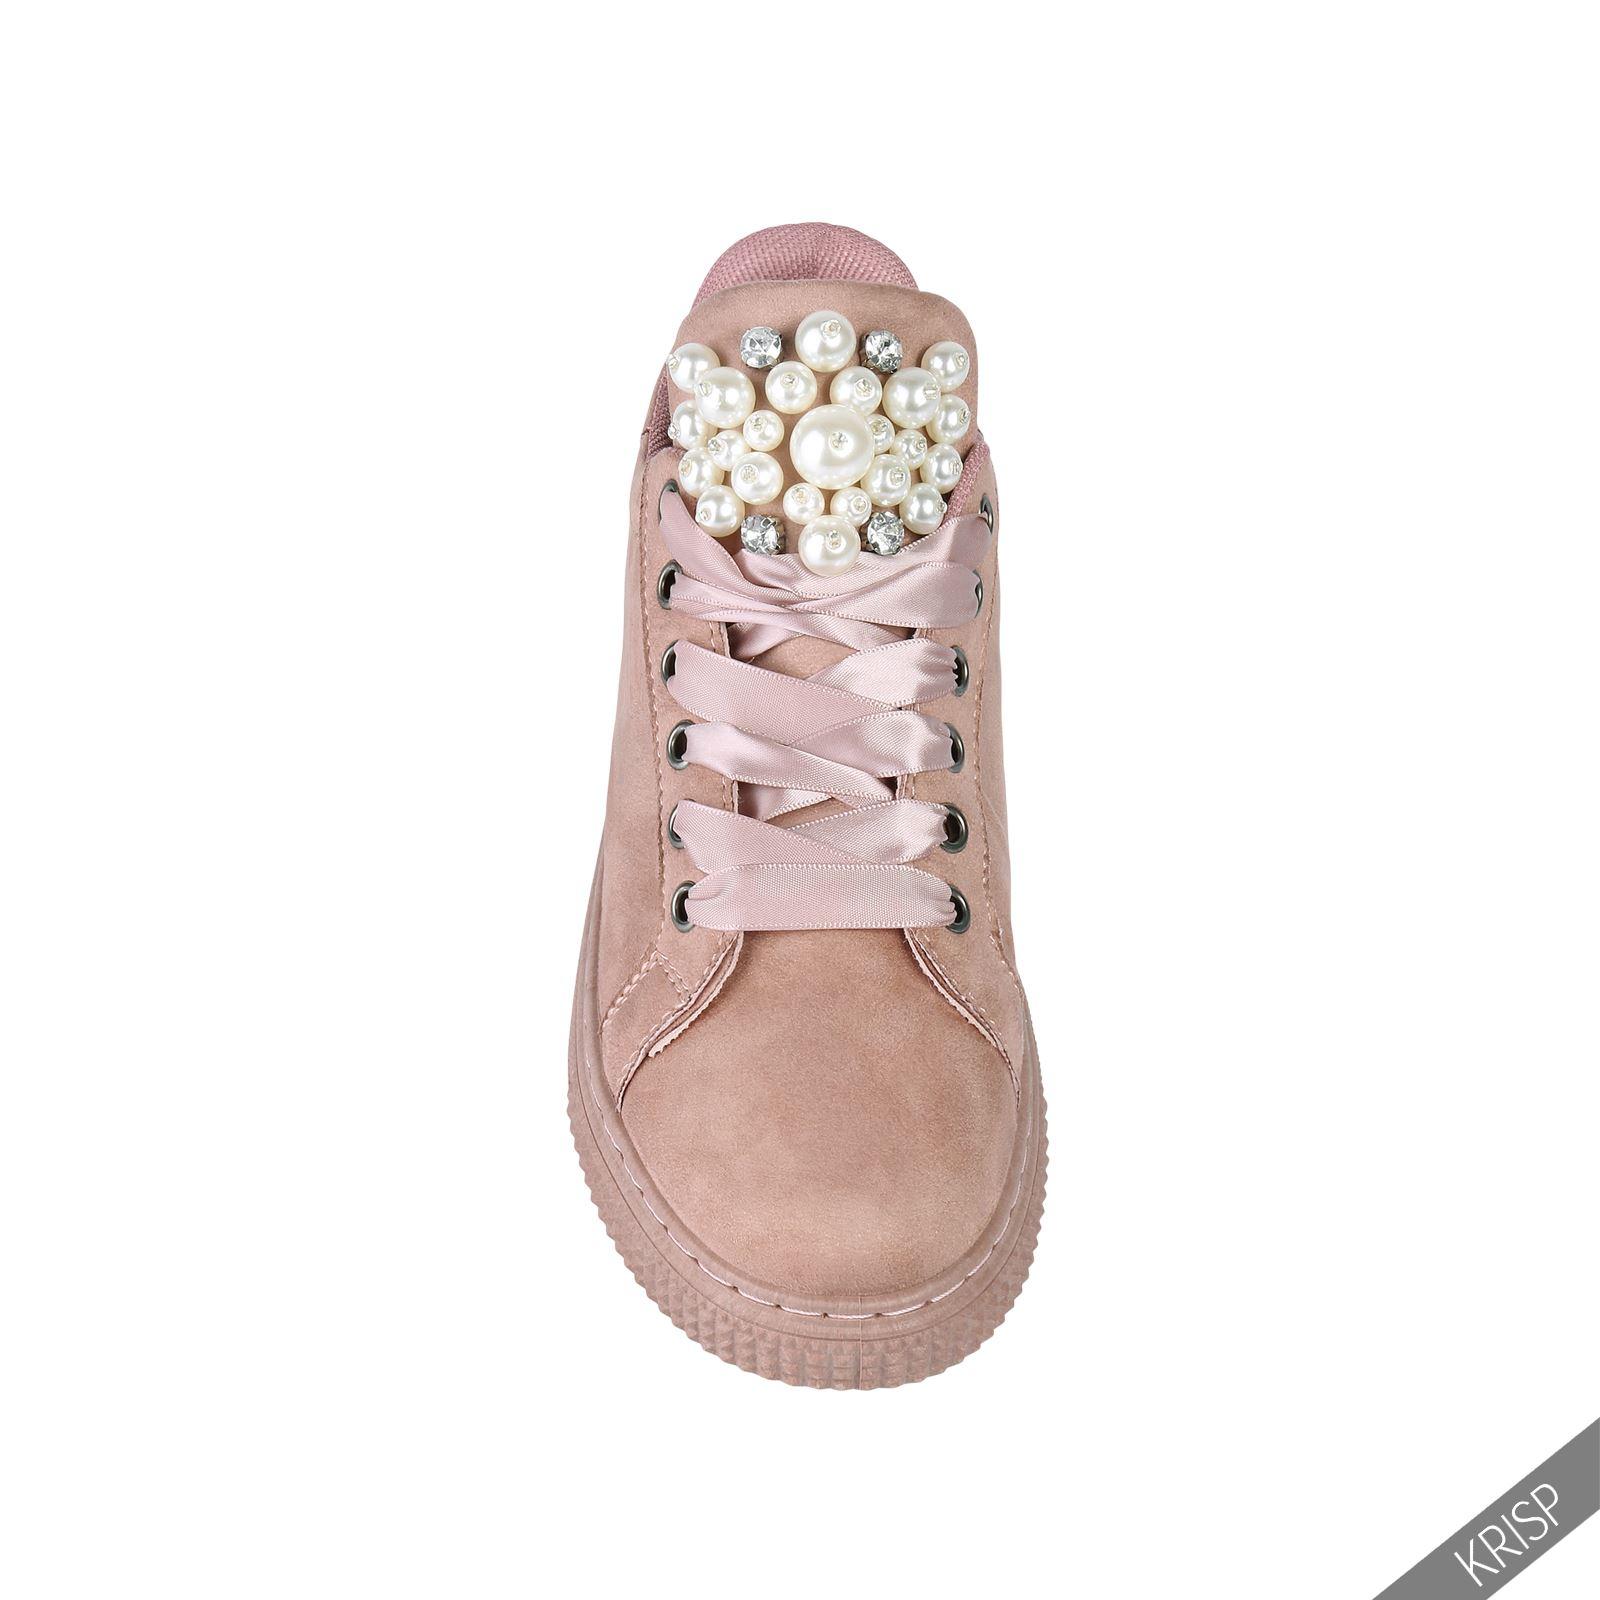 Damen flache sneaker bequeme turnschuhe low top geh kelte for Ordnungssystem fa r schuhe